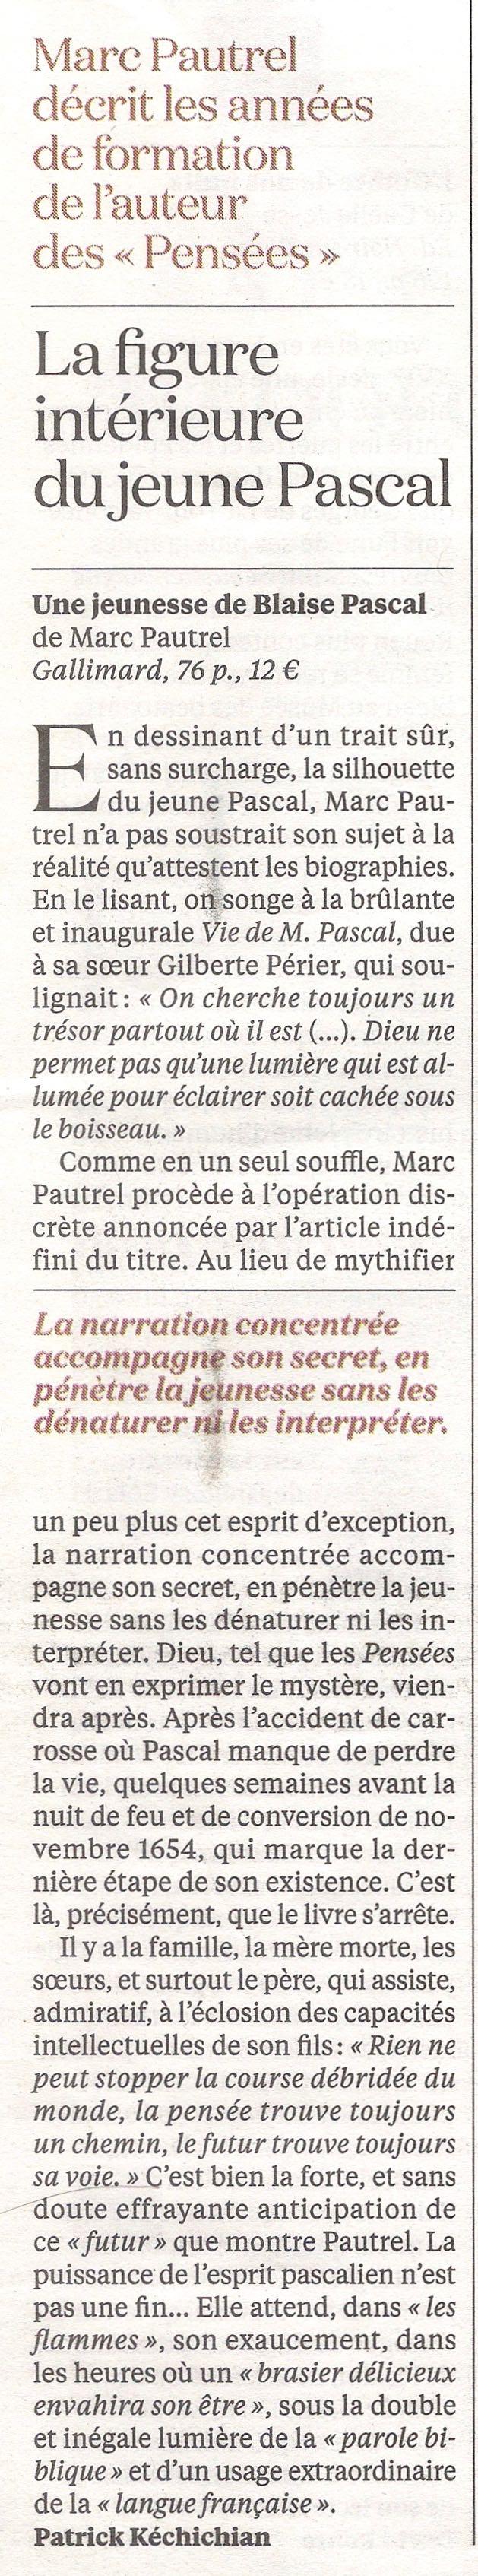 Revue de presse : Le Monde - La ...